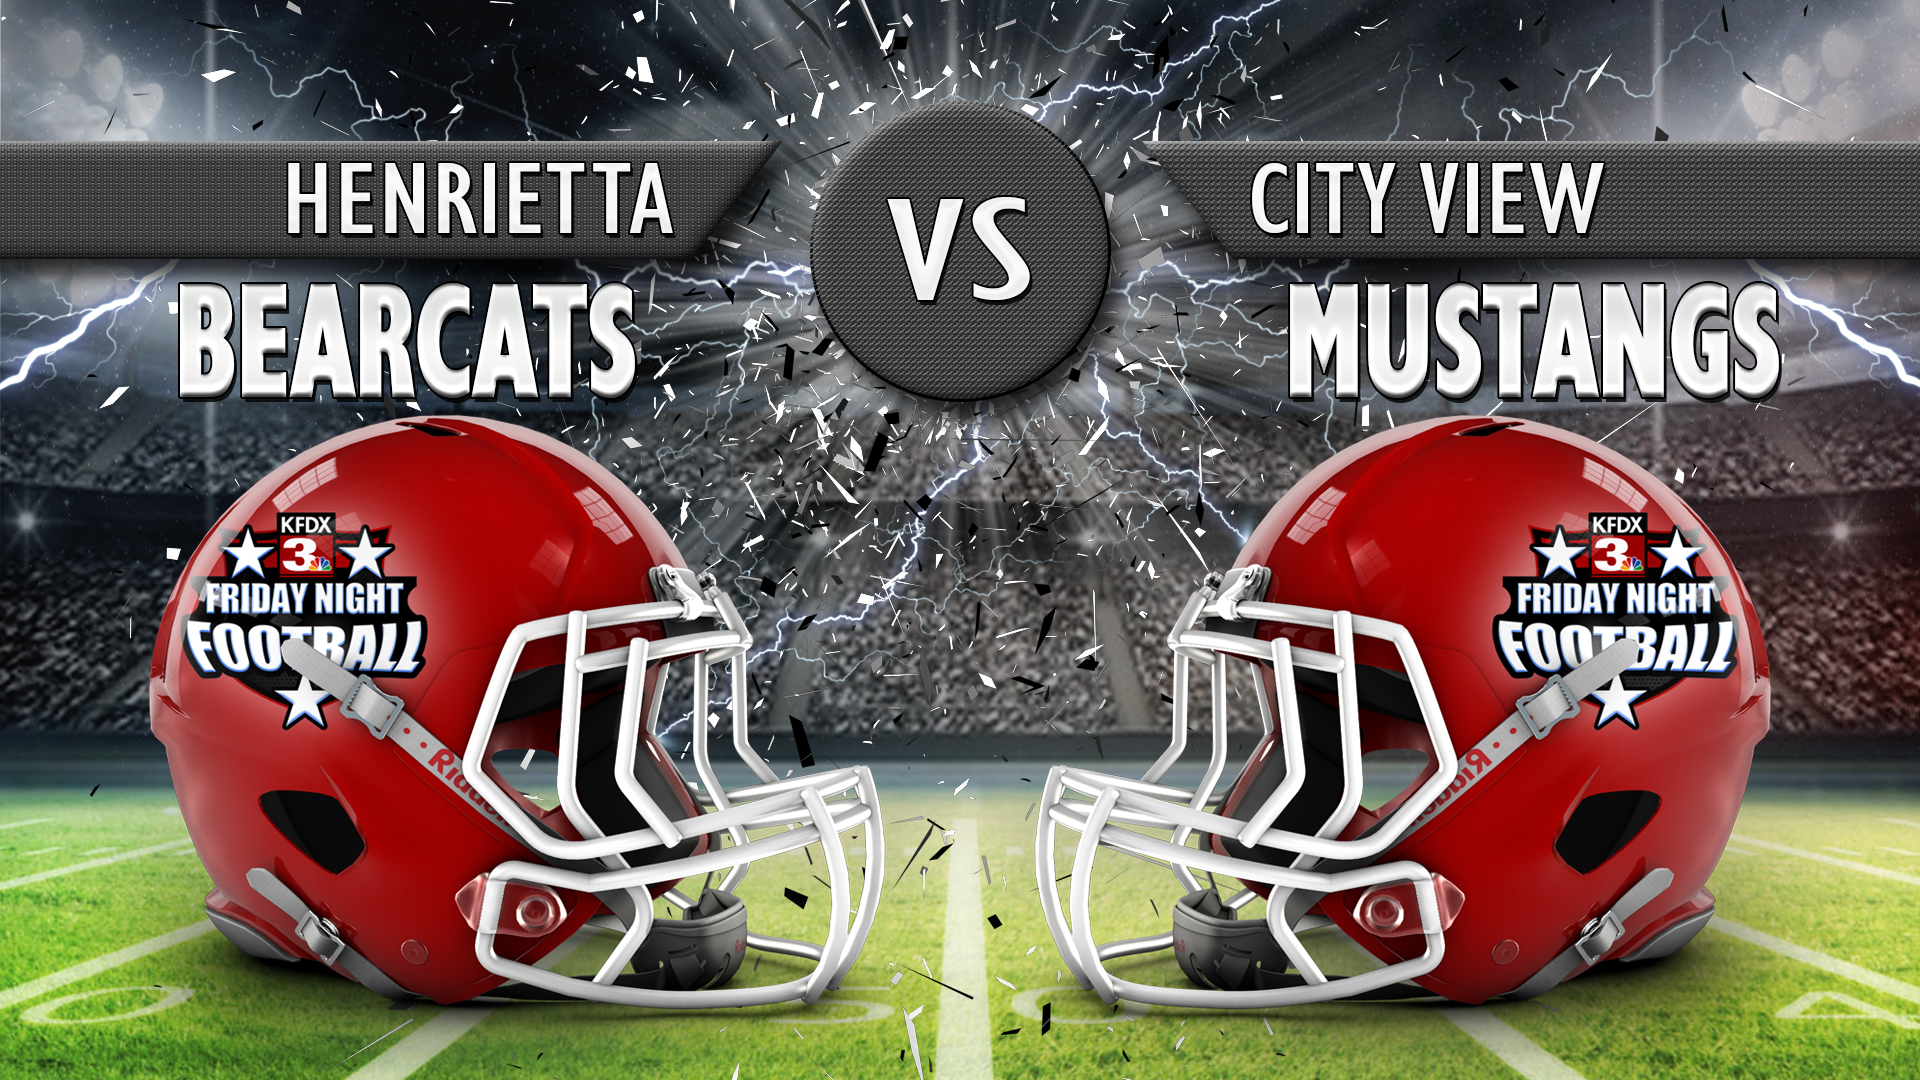 HENRIETTA VS CITY VIEW_1510380568566.jpg